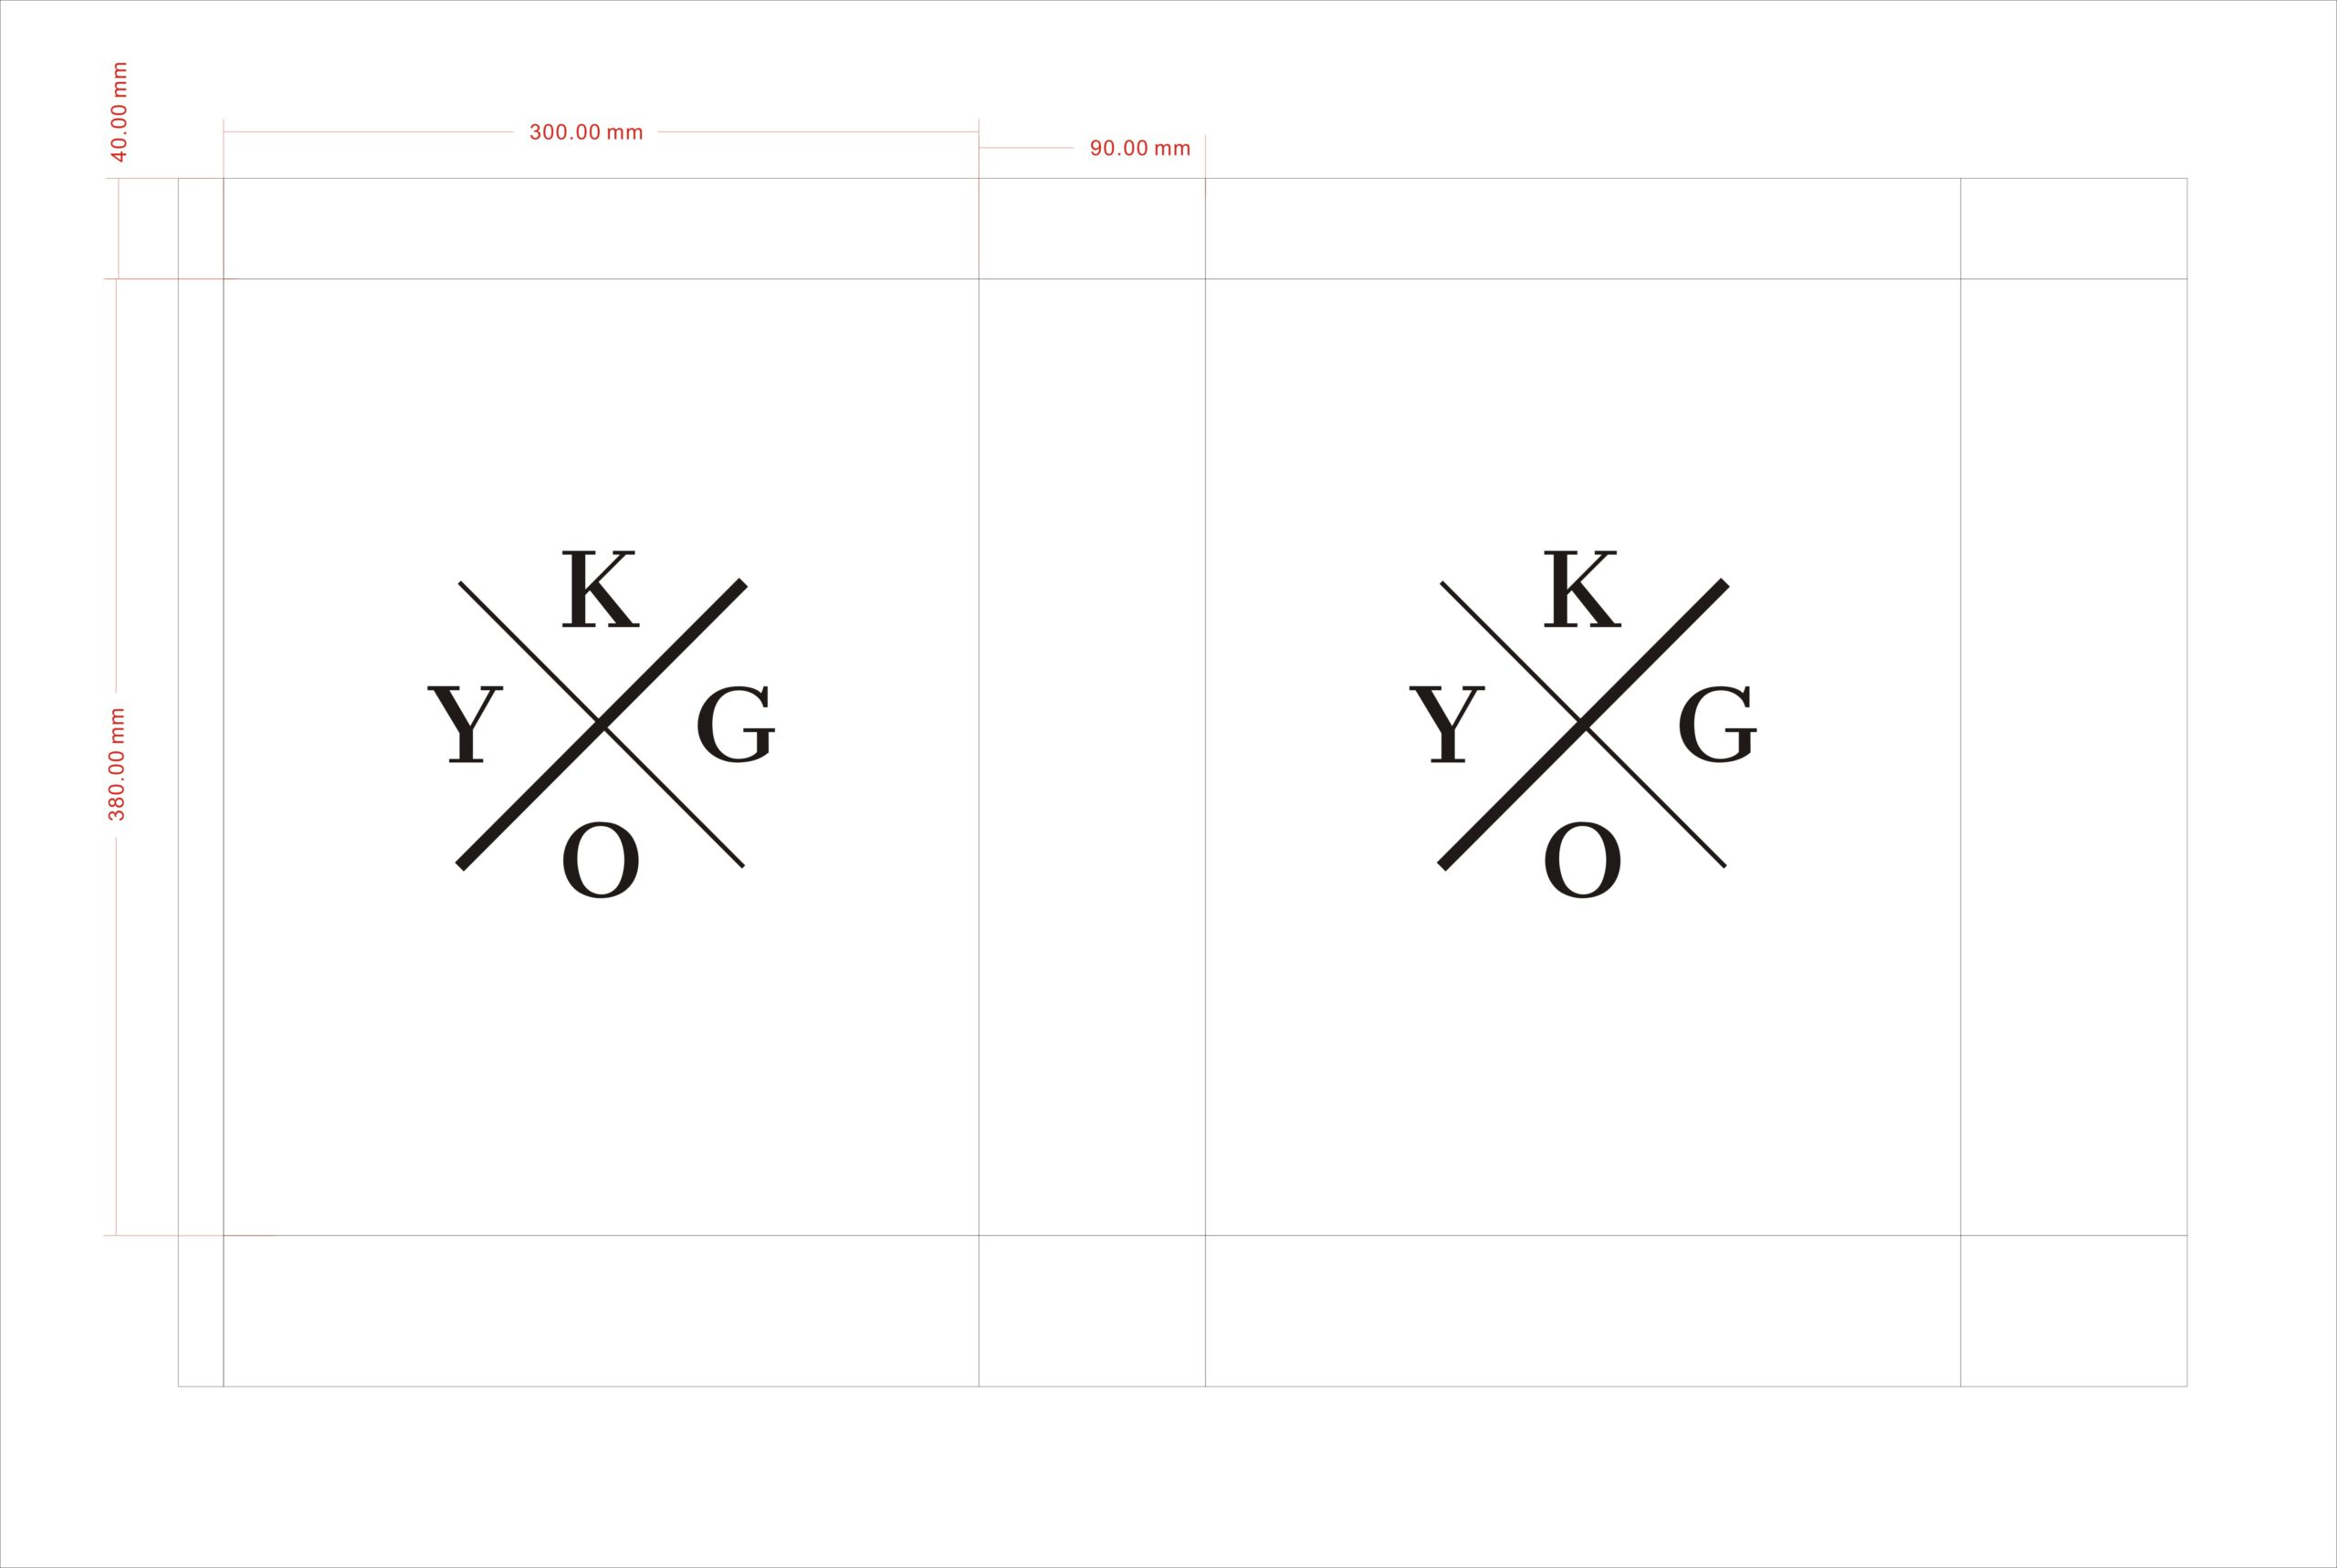 KYGO paper bag artwork